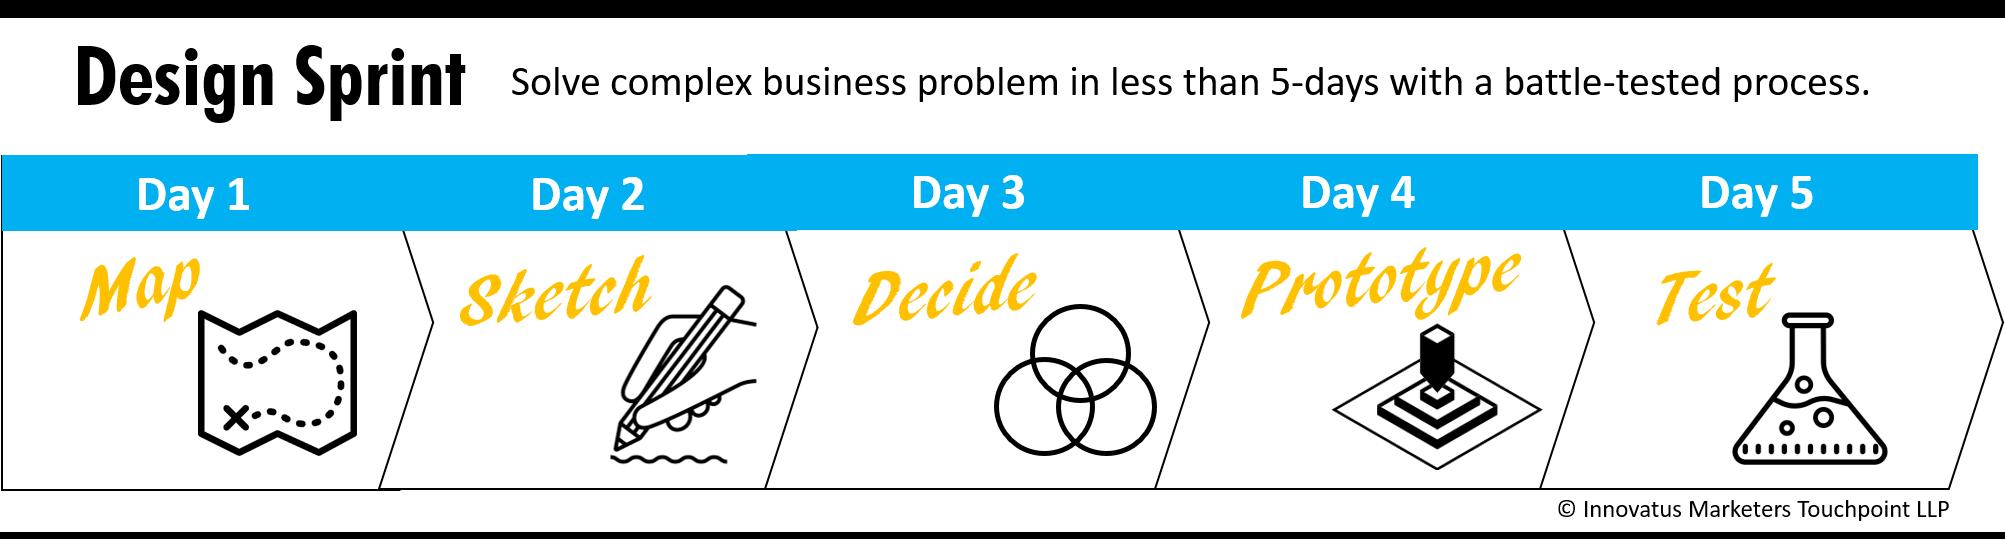 Design Sprint process, design sprint framework, design thinking sprint